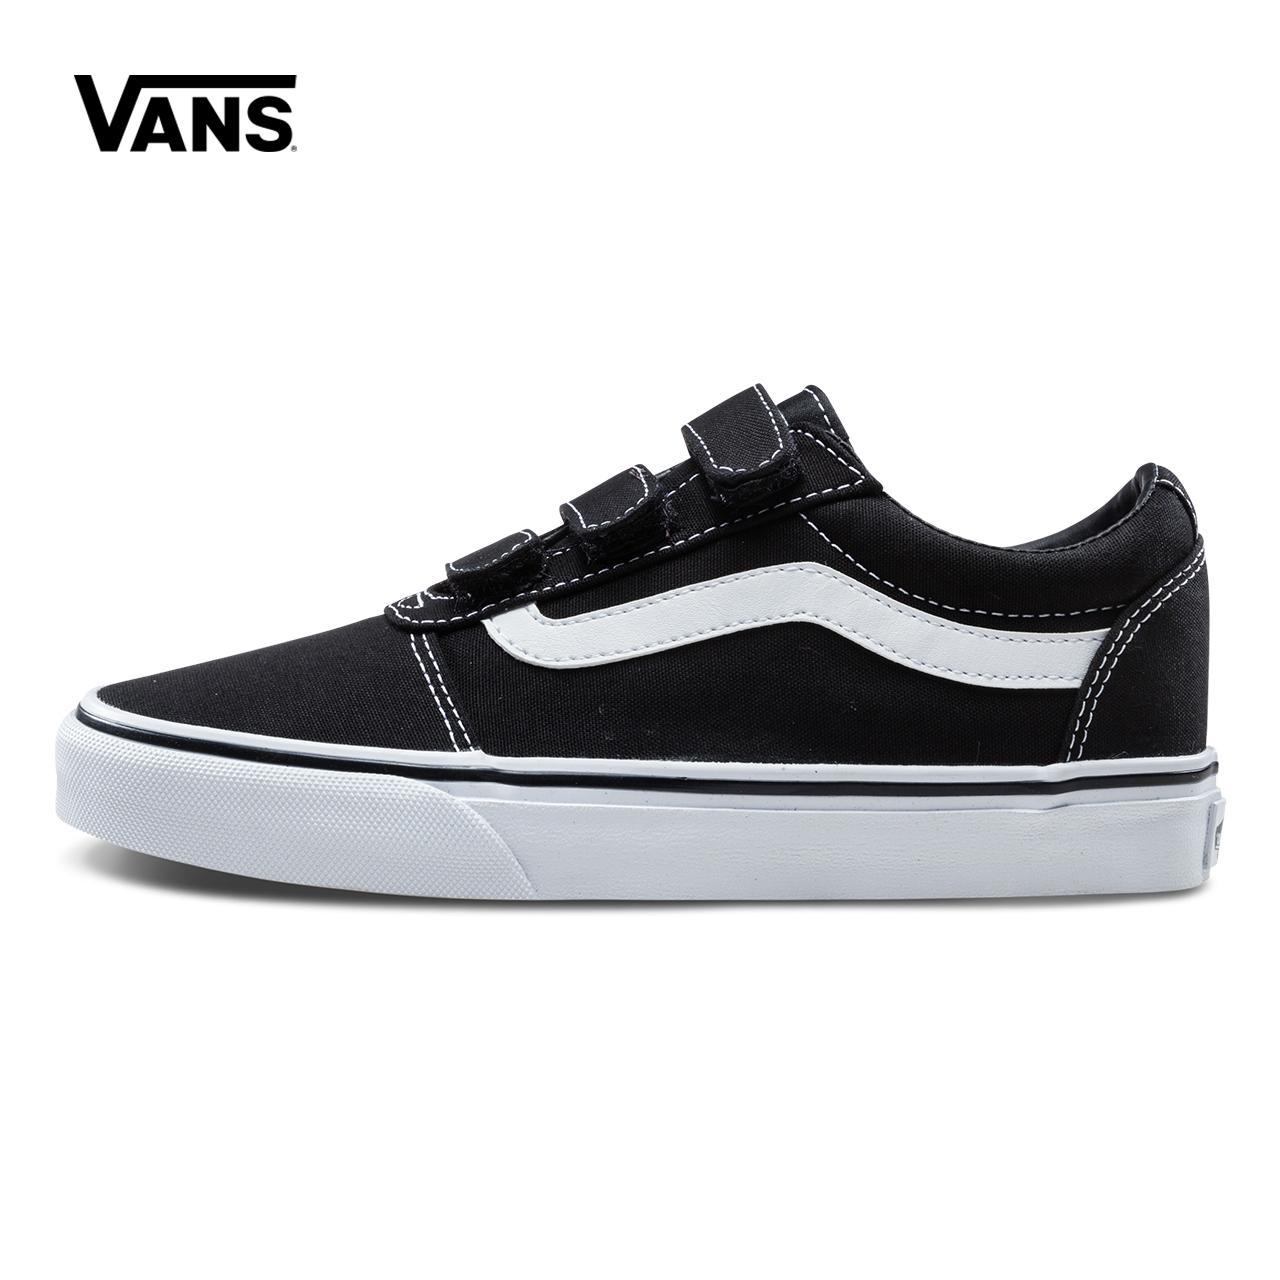 Vans/范斯春季粉色女款运动鞋板鞋 VN0A3MW91WX